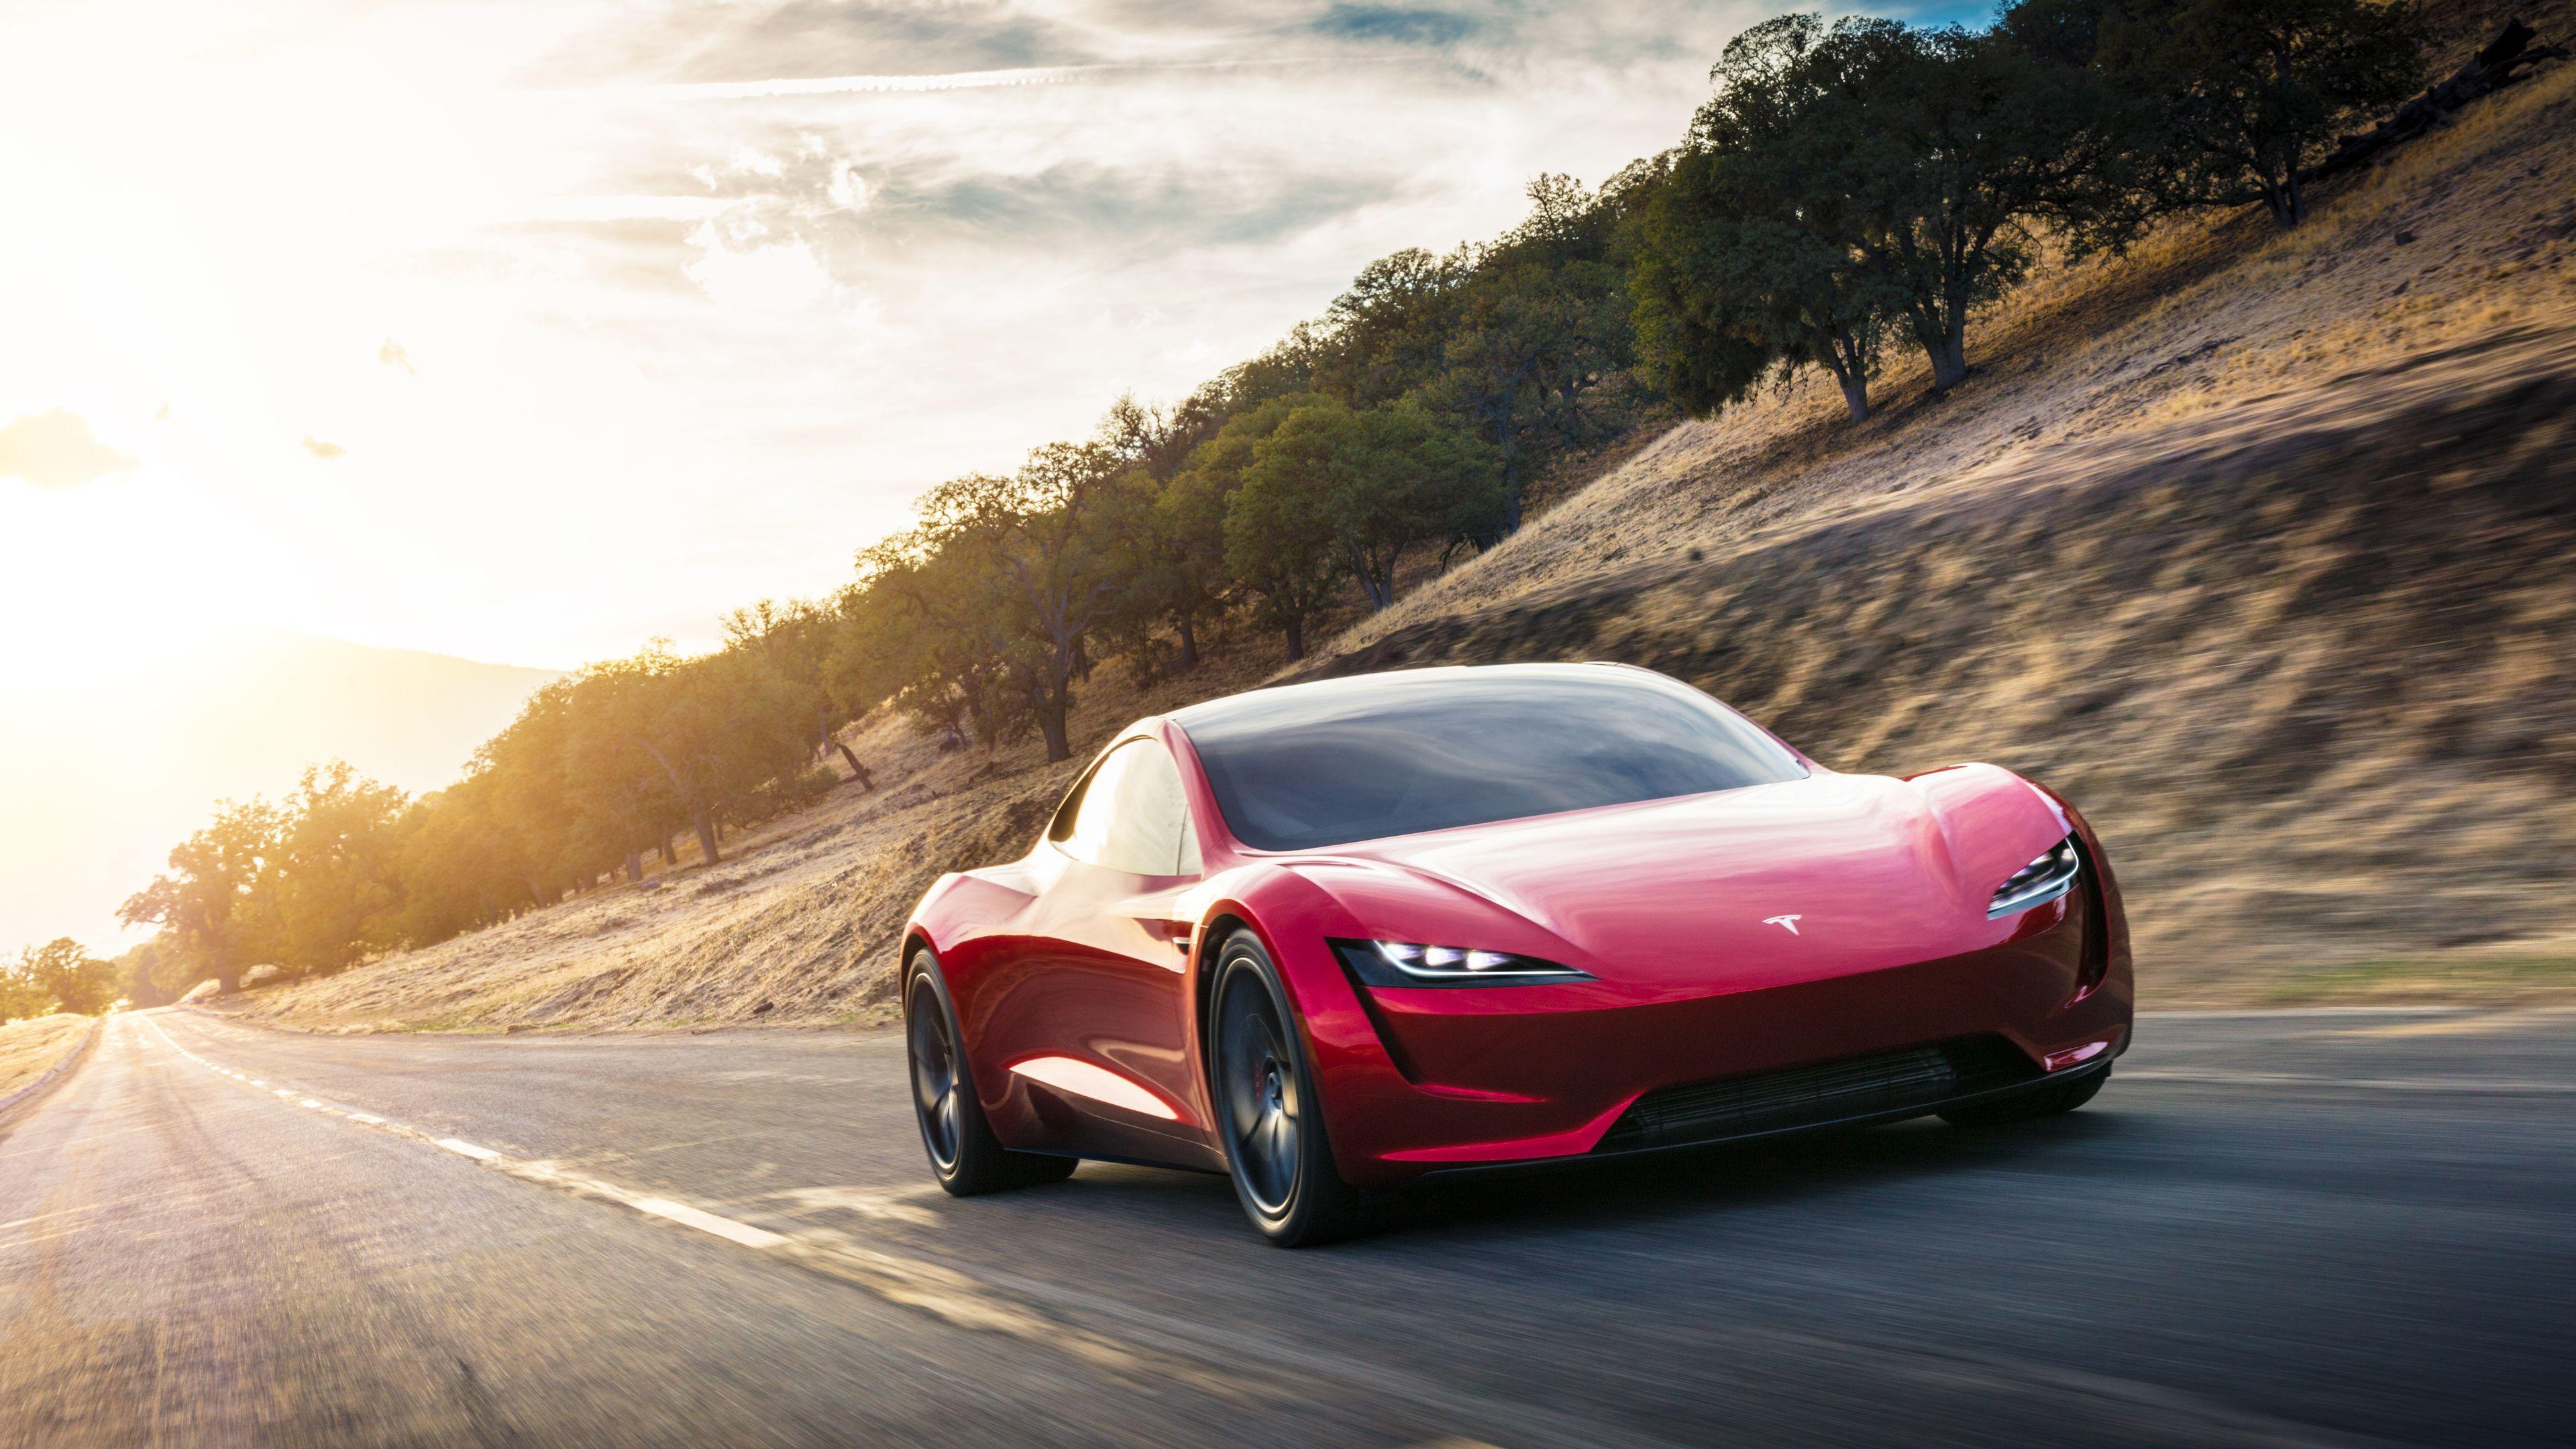 Tesla Roadster Wallpapers Top Free Tesla Roadster Backgrounds Wallpaperaccess